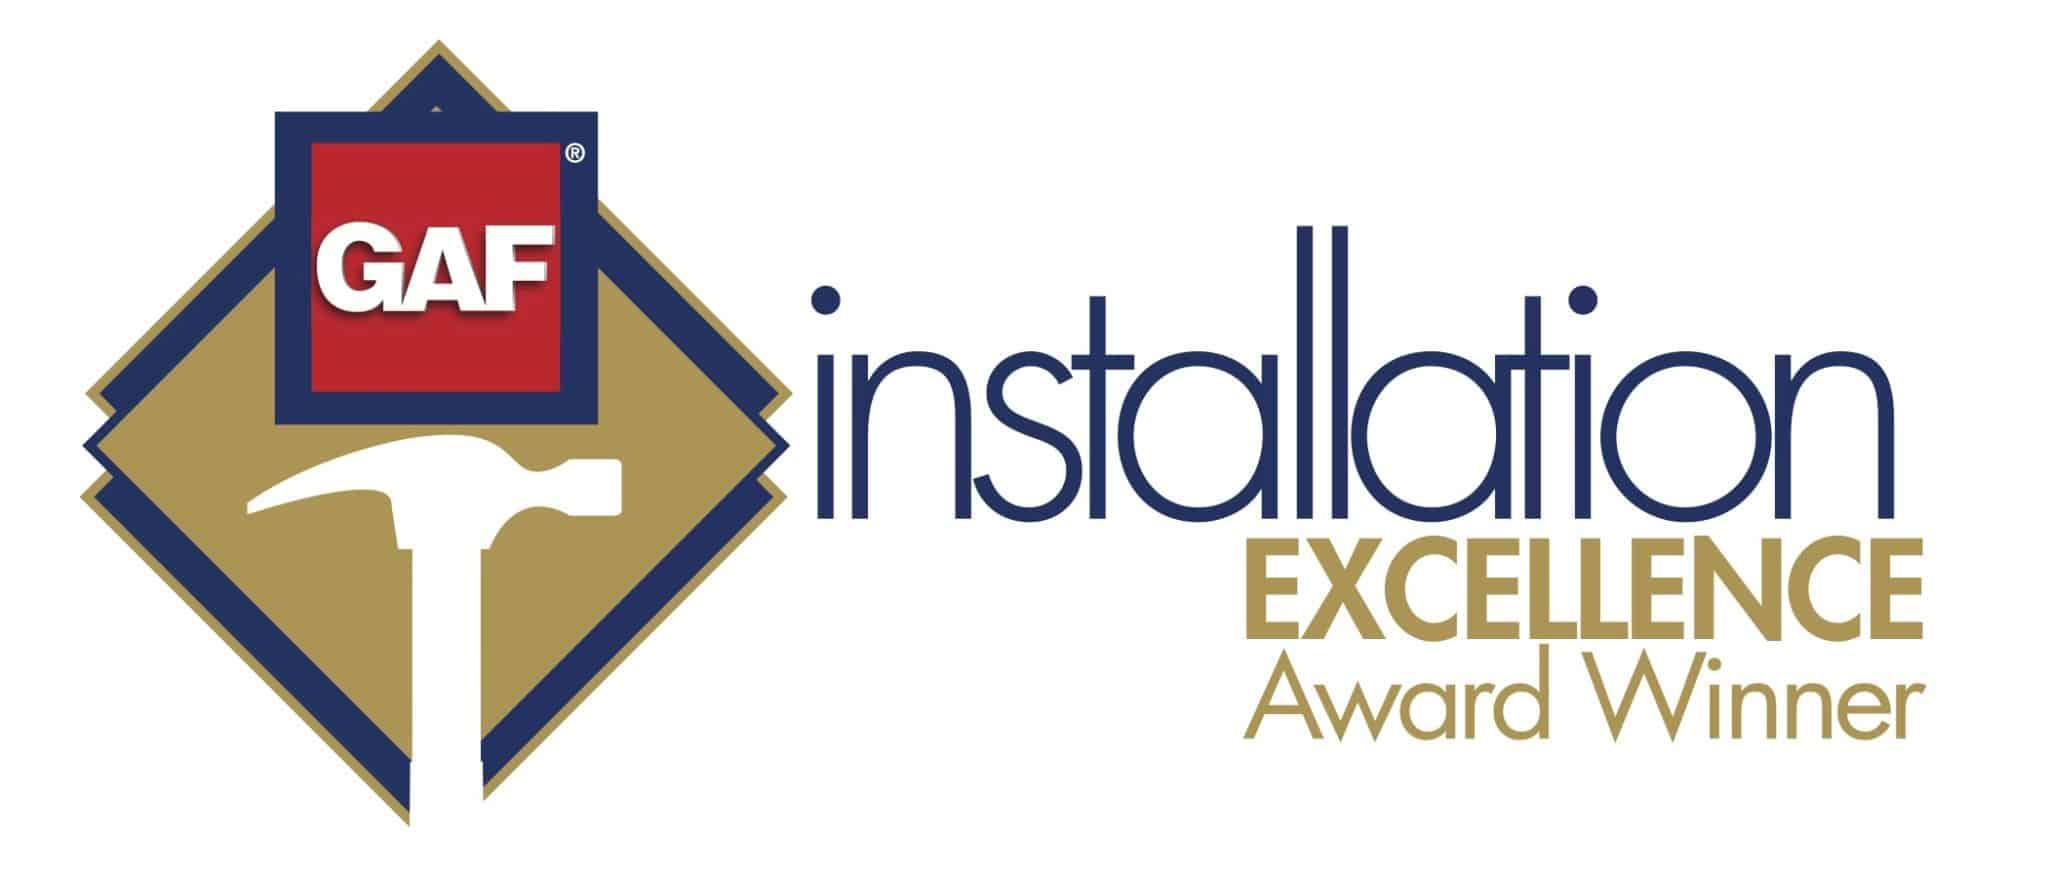 GAF Installation Excellence Award